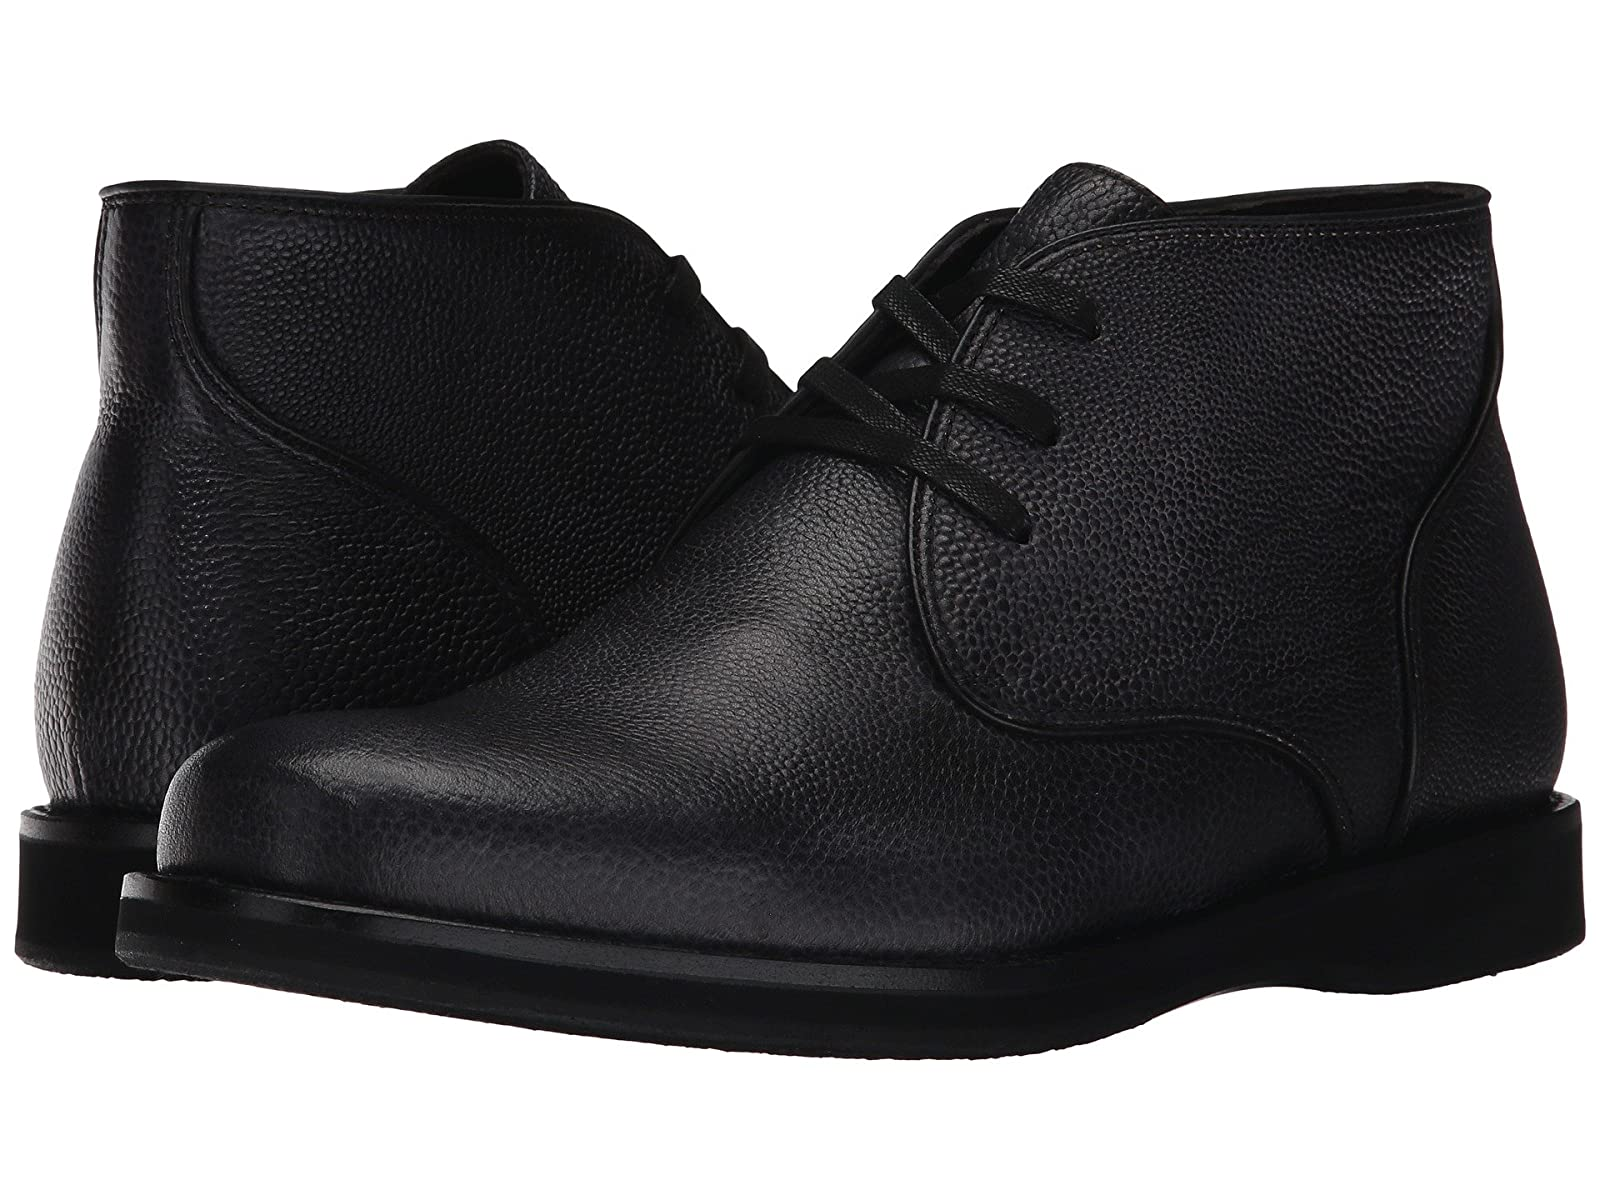 John Varvatos Brooklyn ChukkaAffordable and distinctive shoes